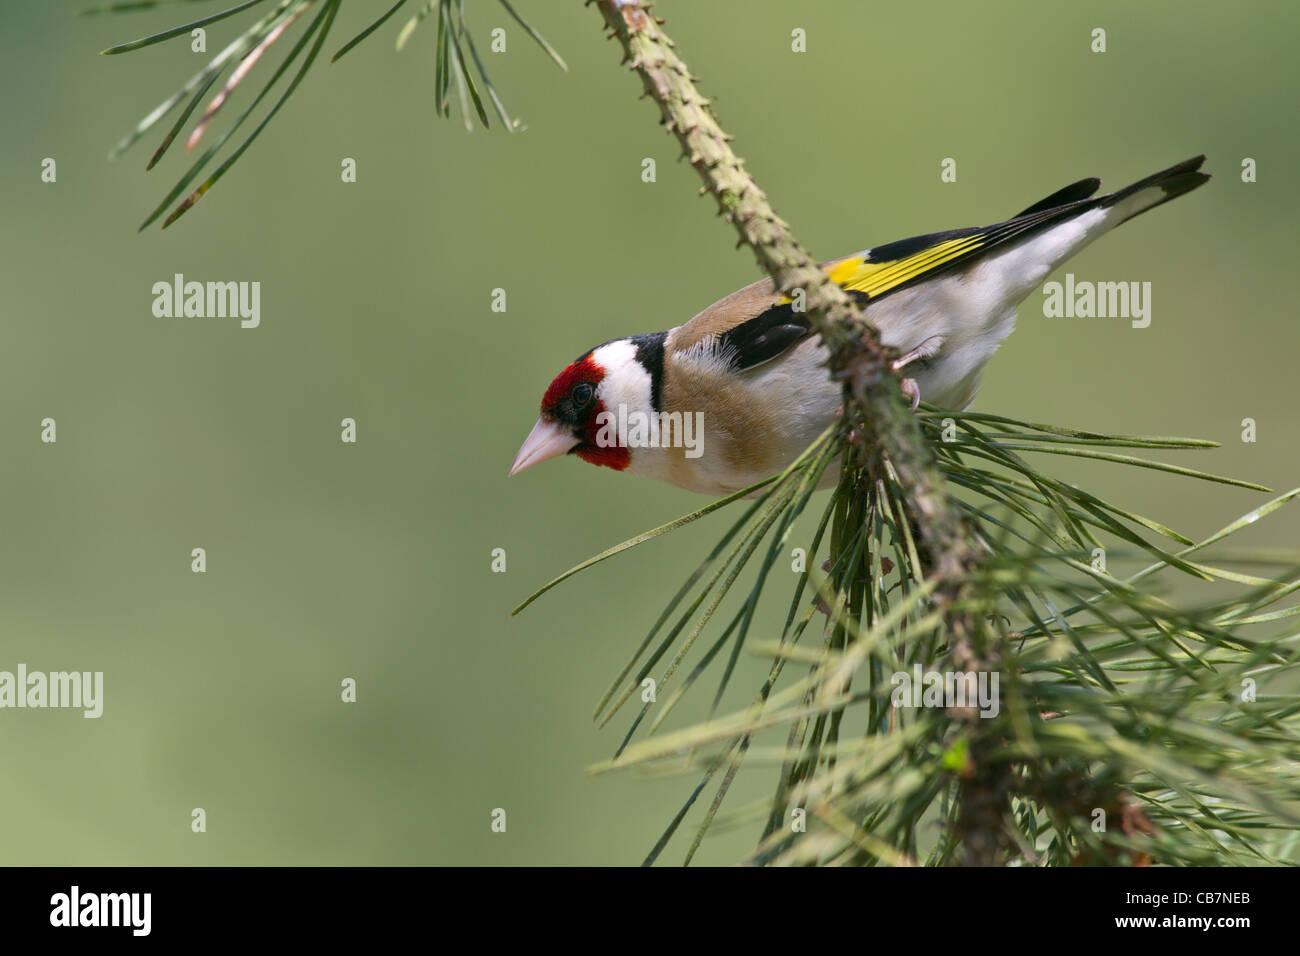 European Goldfinch (Carduelis carduelis) - Stock Image